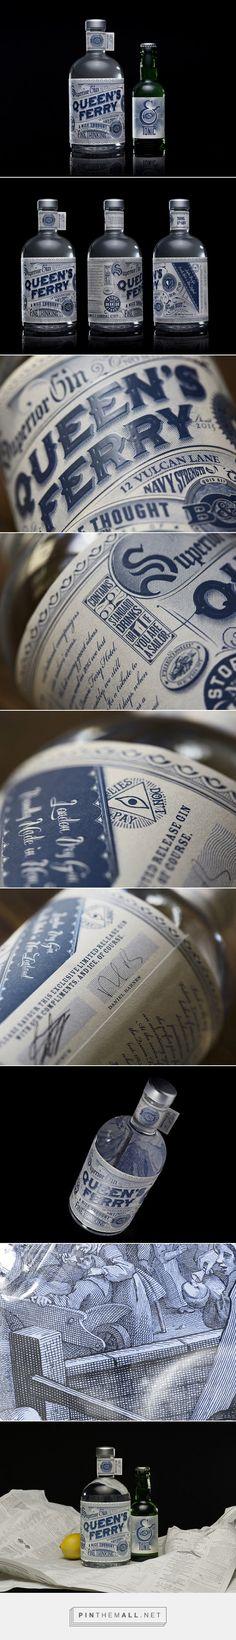 Queen's Ferry Gin by Barnes, Catmur & Friends